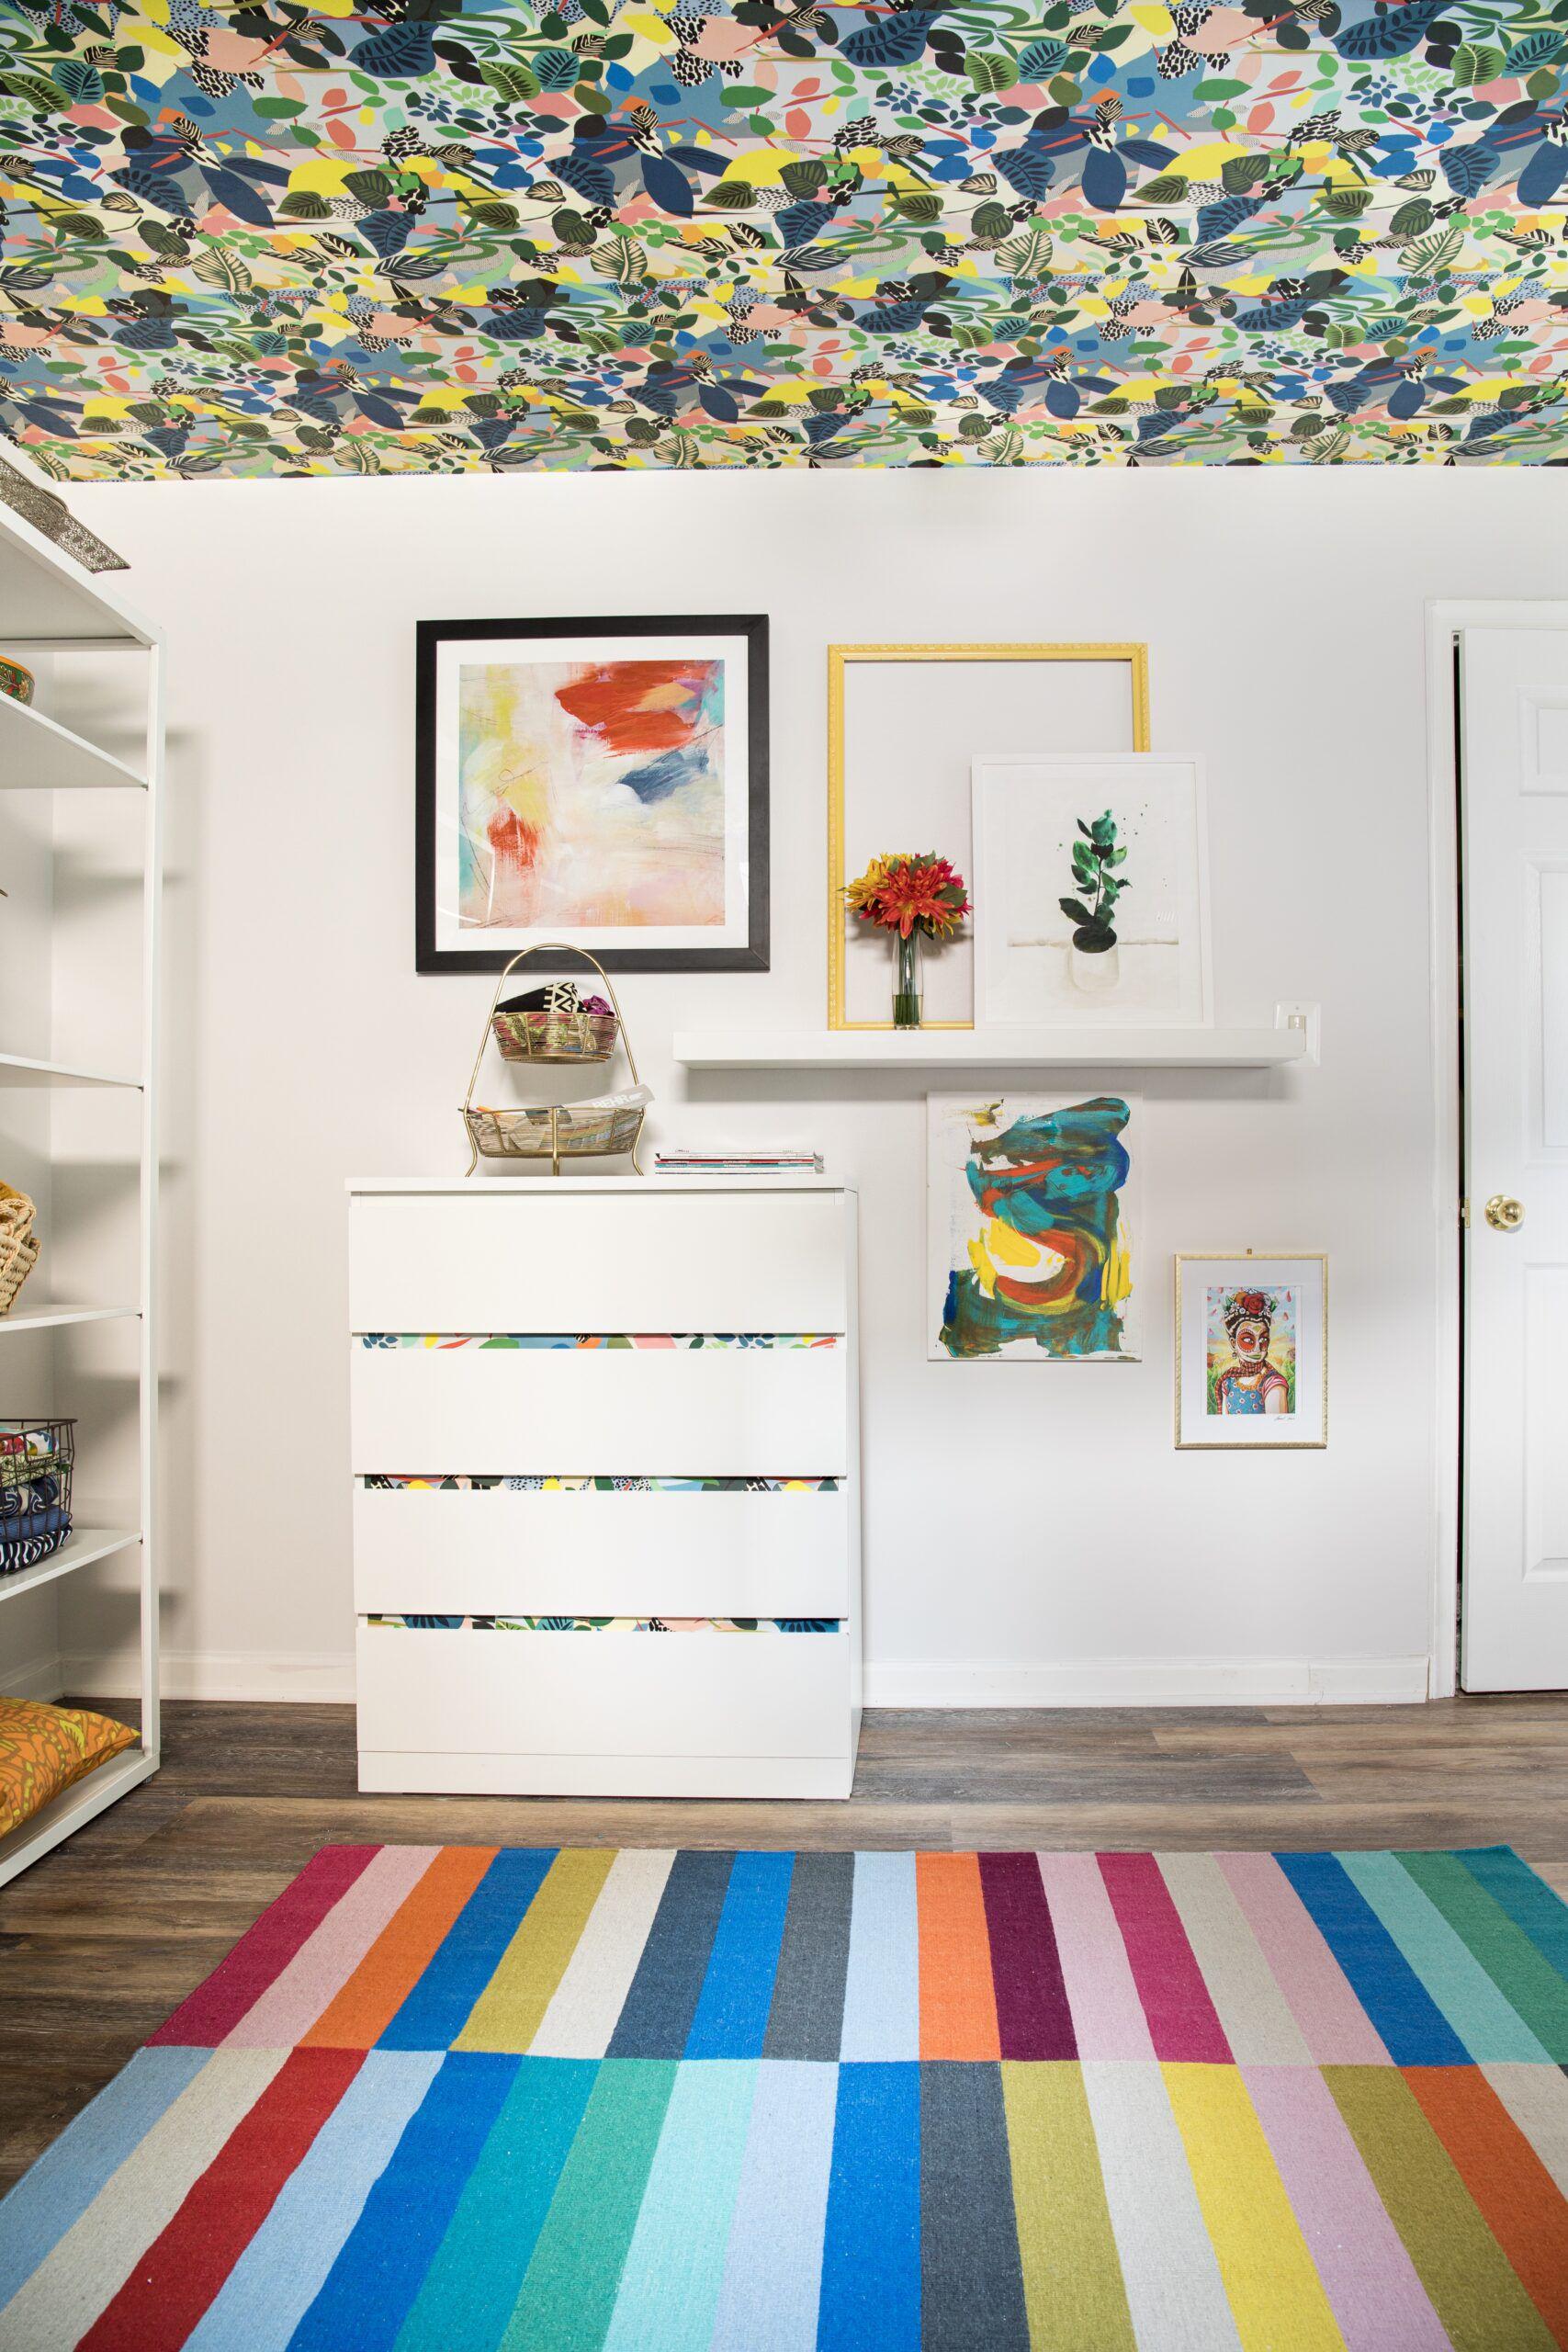 Hockney Wallpaper • Stephanie Watkins • CasaWatkinsLivingBlog •Colorful Wallpaper